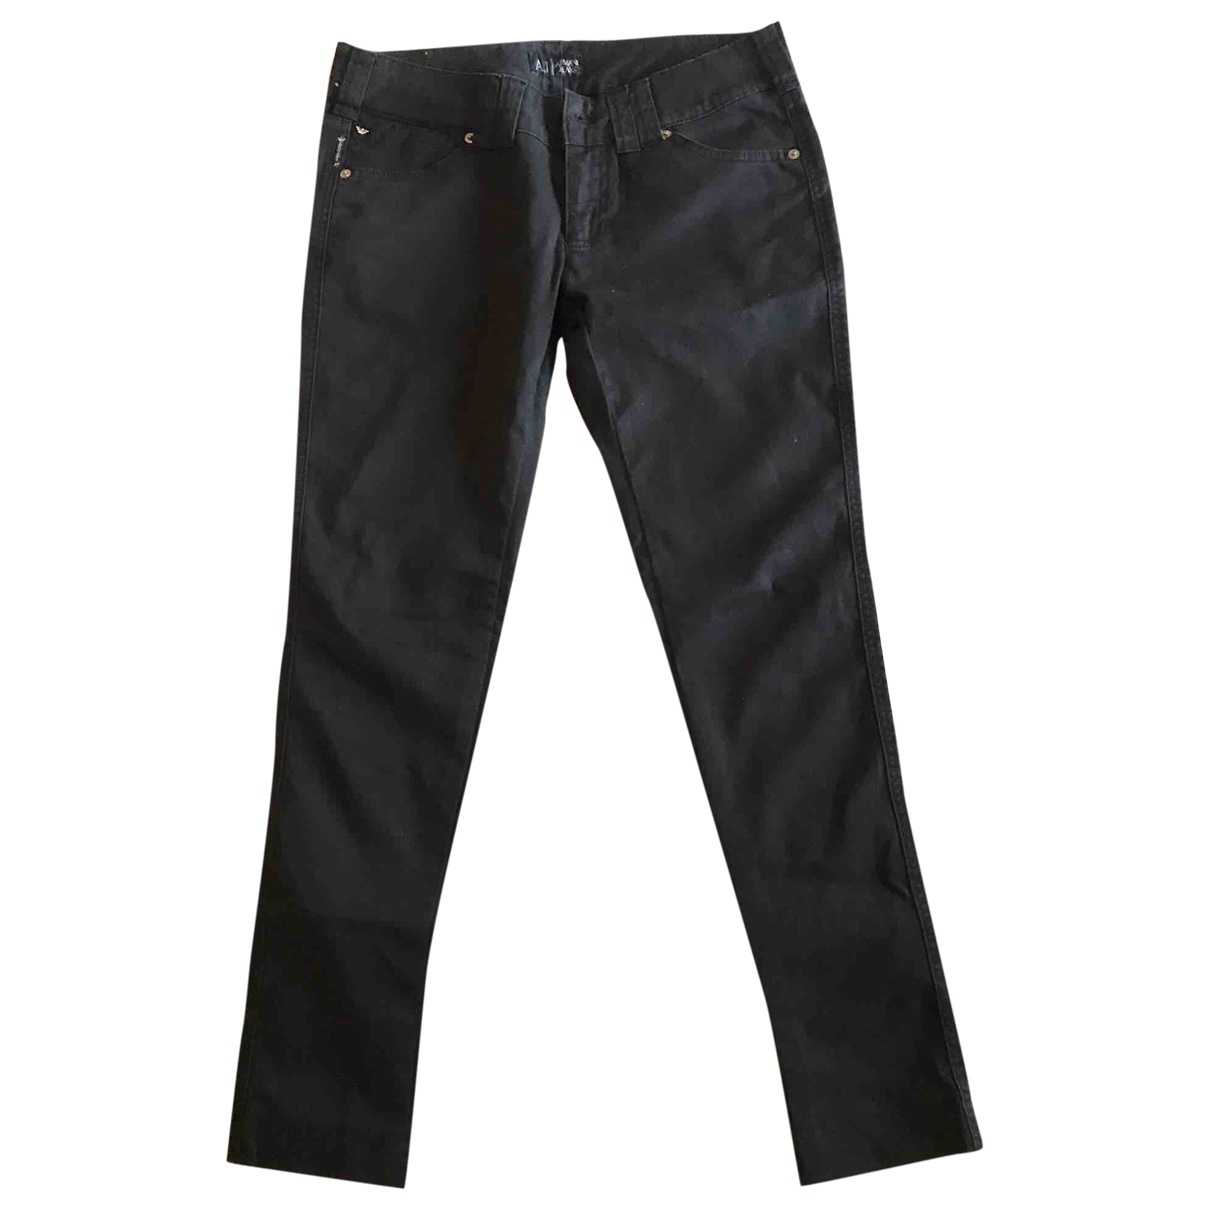 Armani Jeans \N Black Cotton - elasthane Jeans for Women 28 US